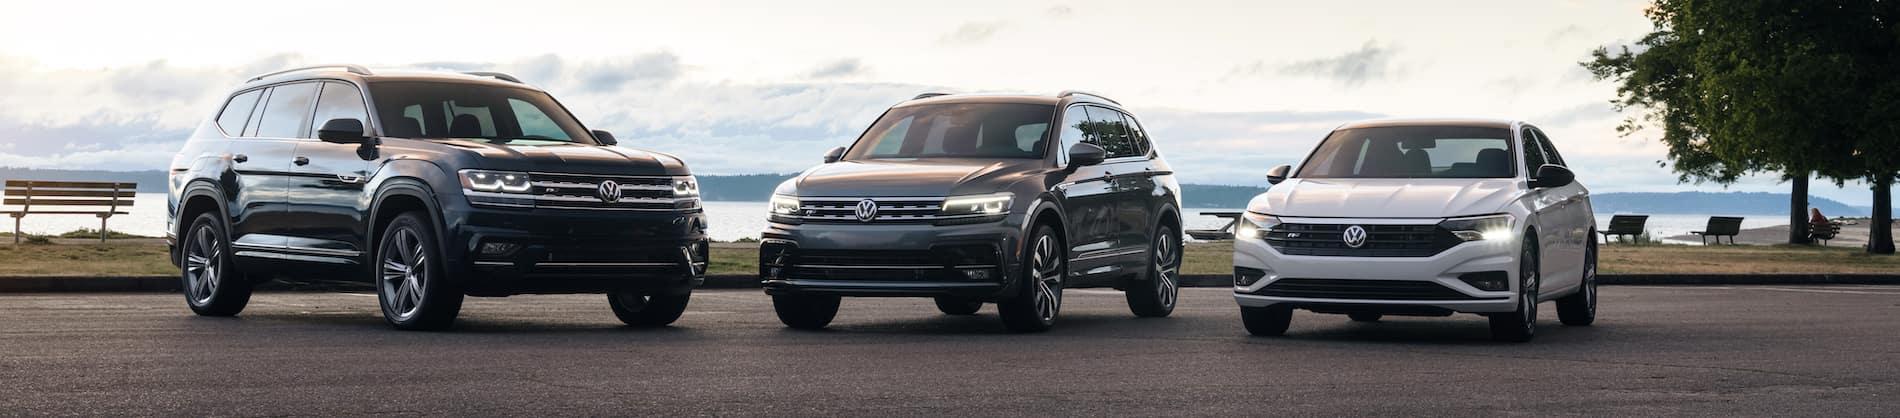 Certified Pre-Owned Volkswagen Vehicle Line Up